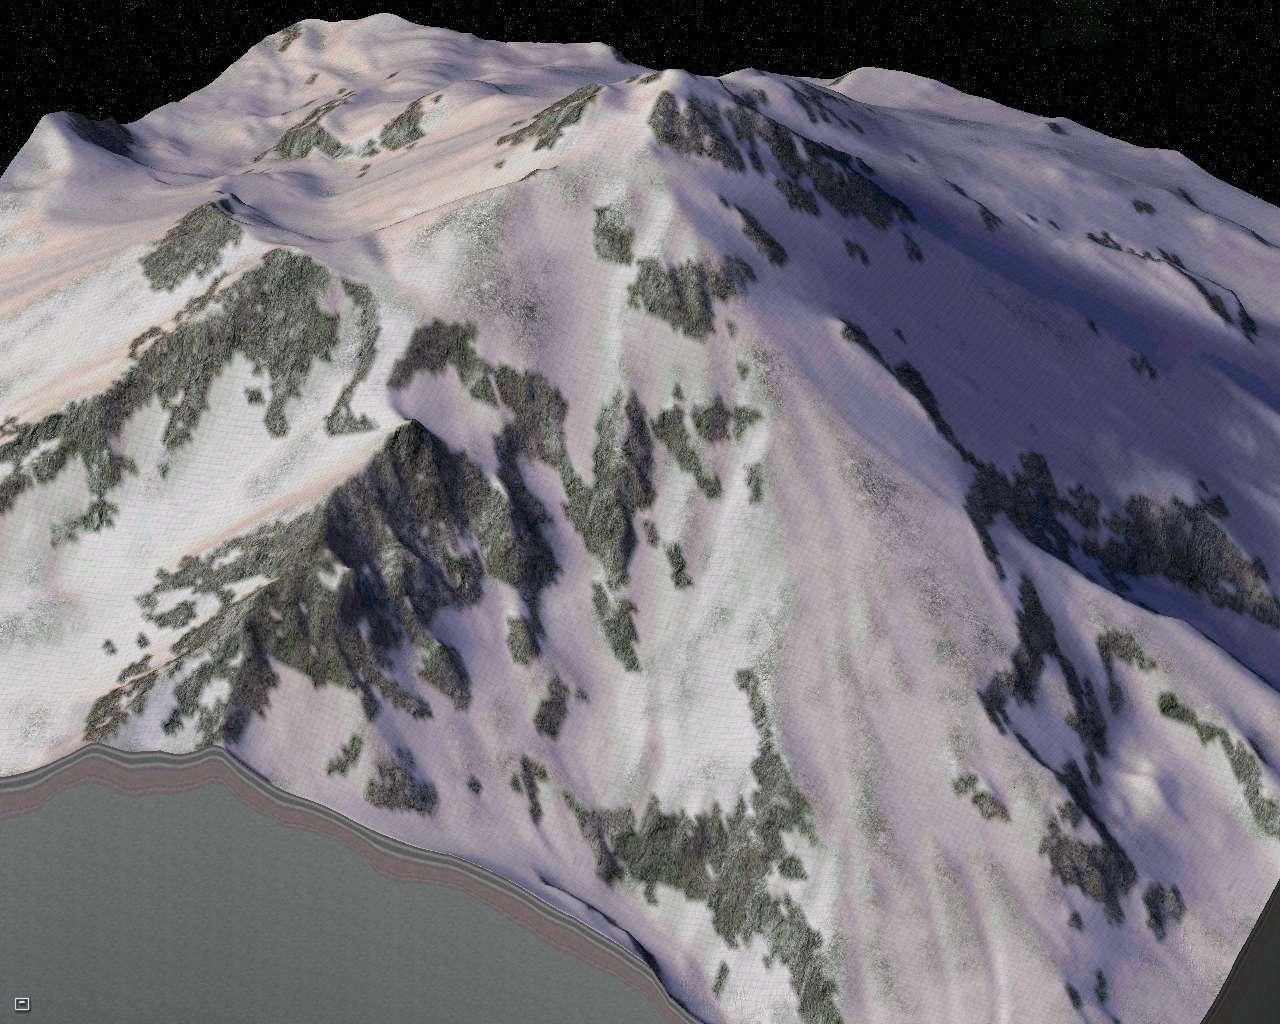 terrain%20tut%20mtn%20before.jpg?psid=1